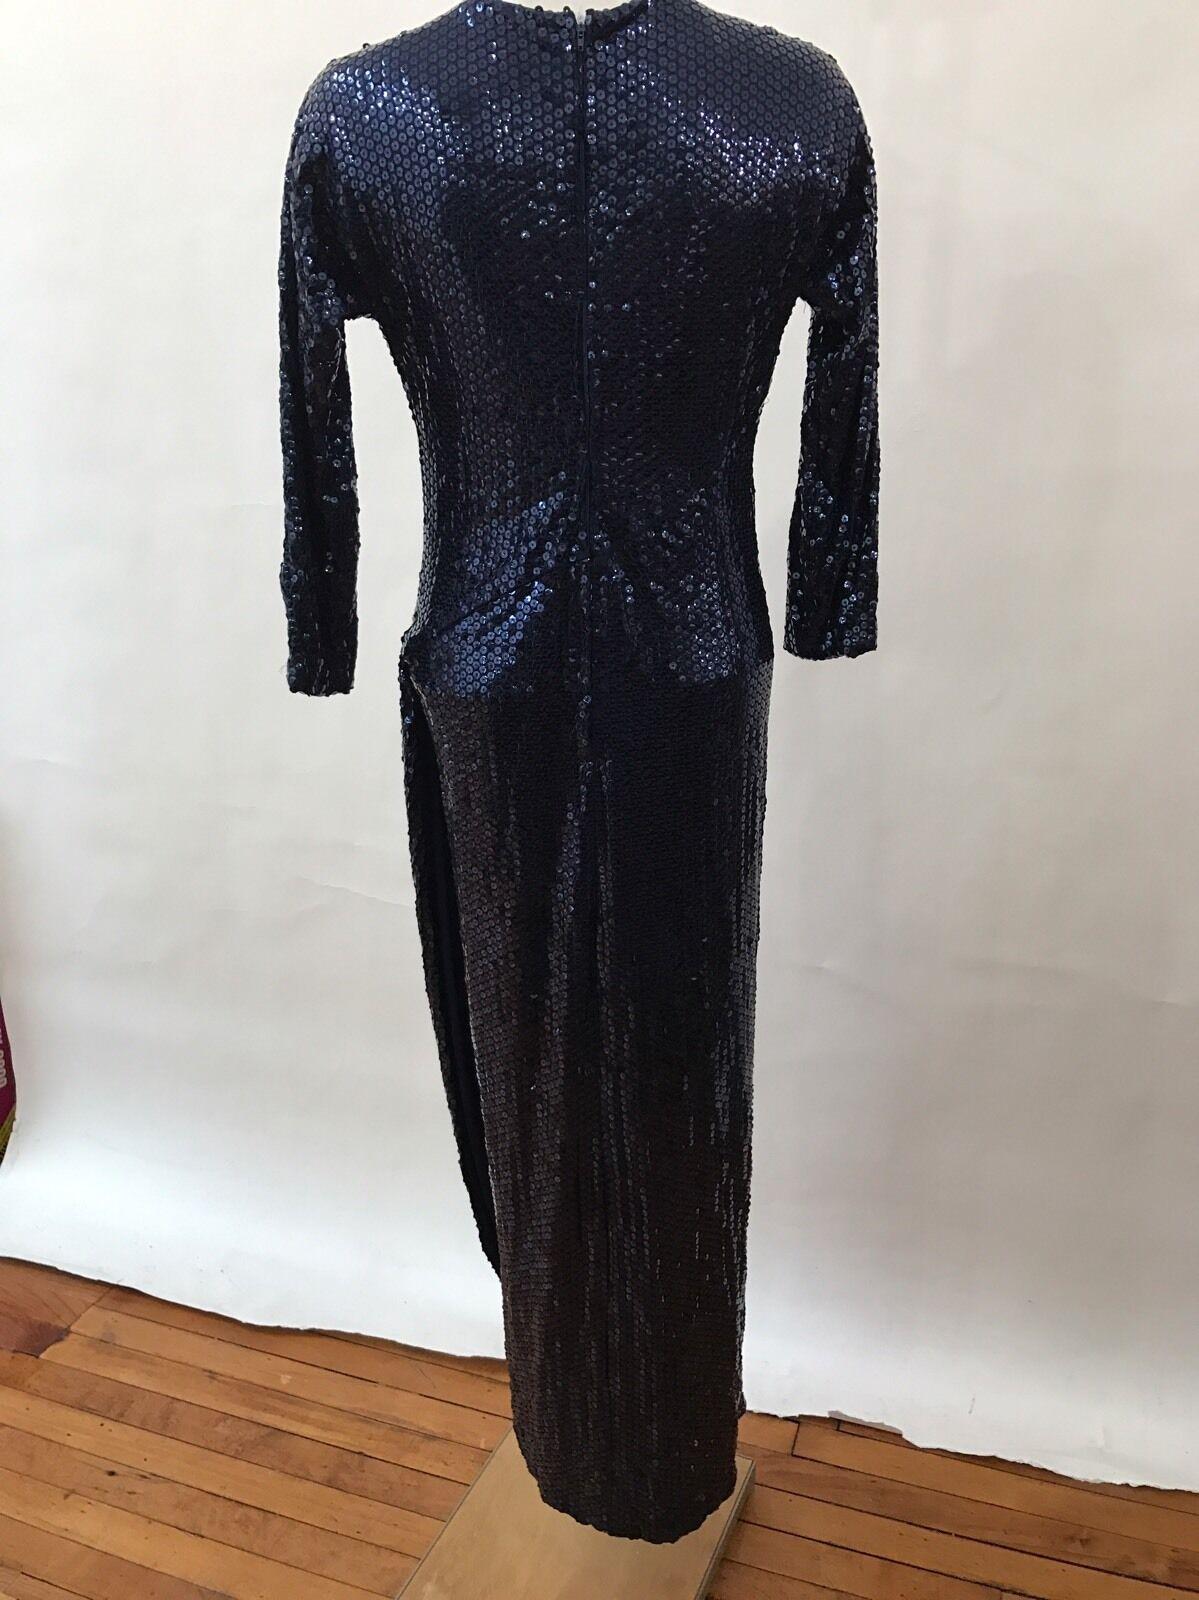 Dominic Rompollo Dress Gown bluee Beaded Formal Formal Formal Long Sleeve 10 085765